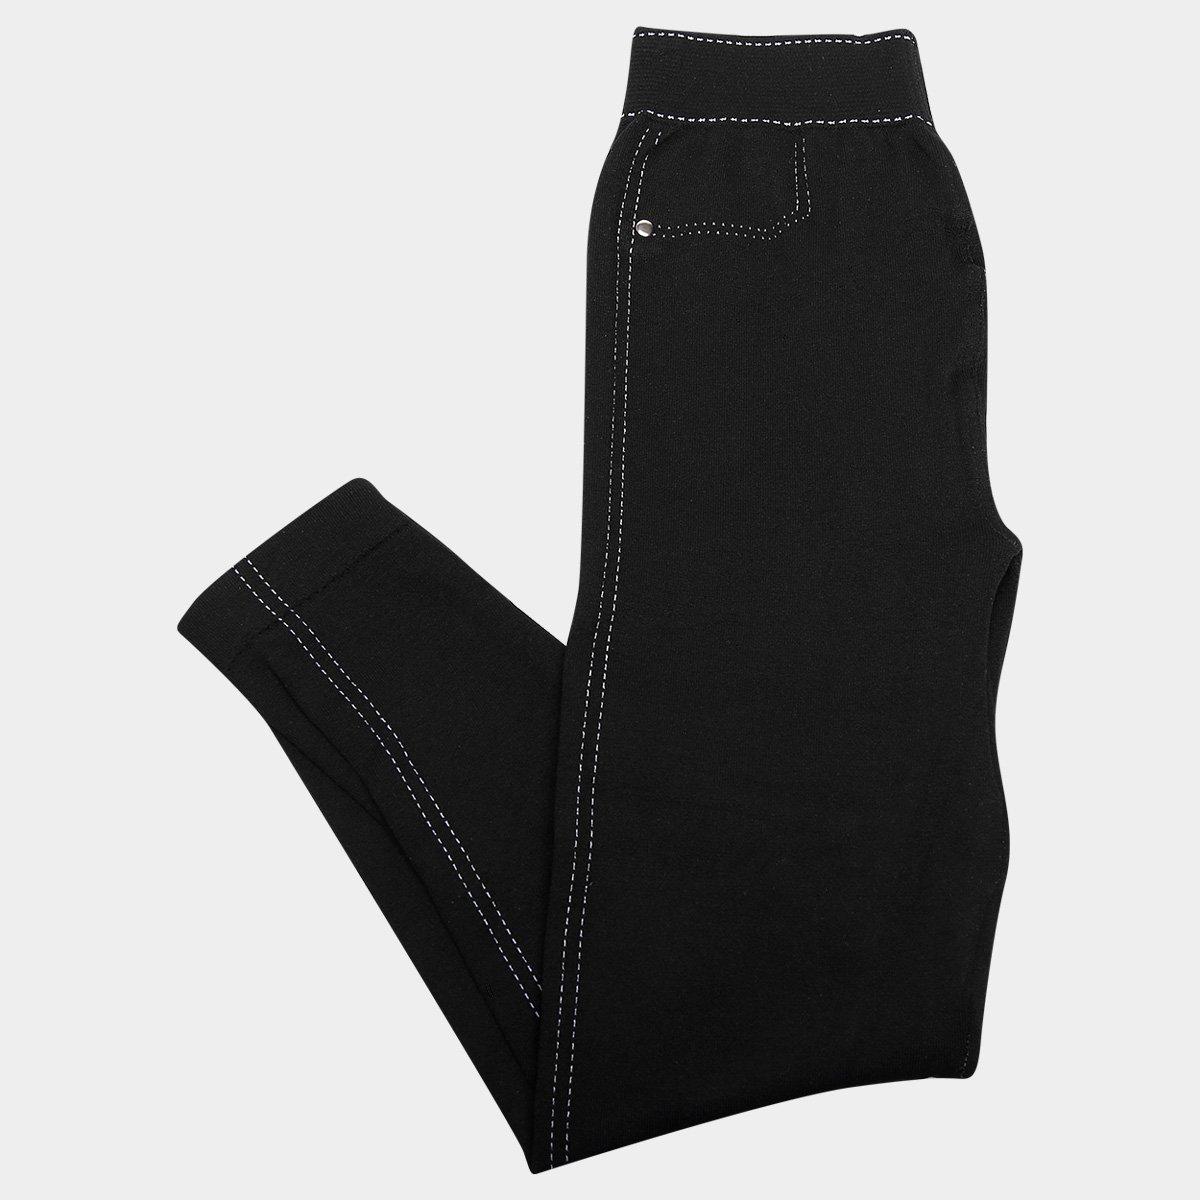 b25825652 Meia Calça Infantil Lupo Legging Jeans